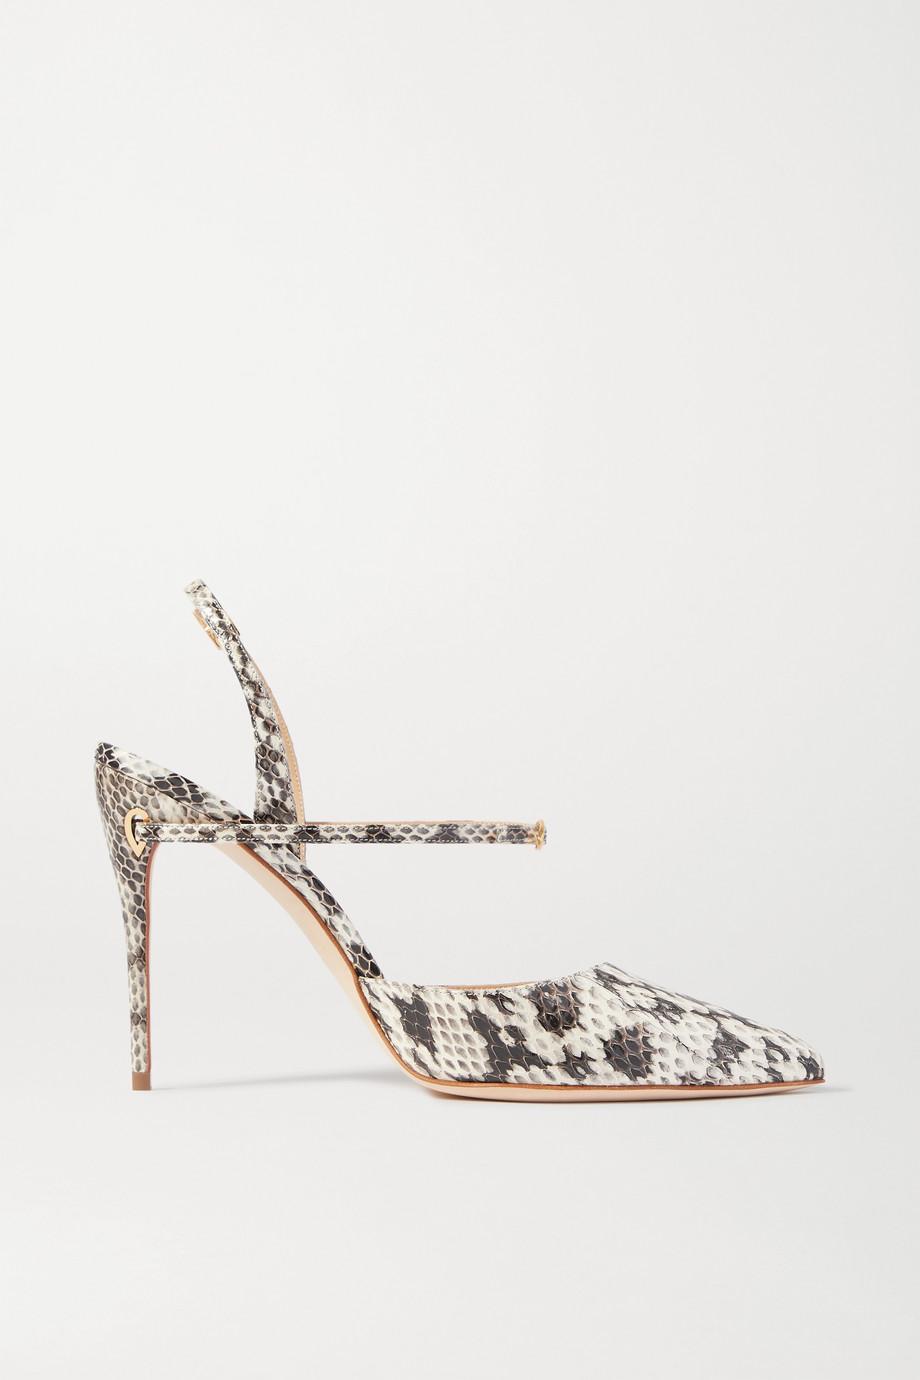 Jennifer Chamandi Vittorio 105 金蛇皮露跟高跟鞋